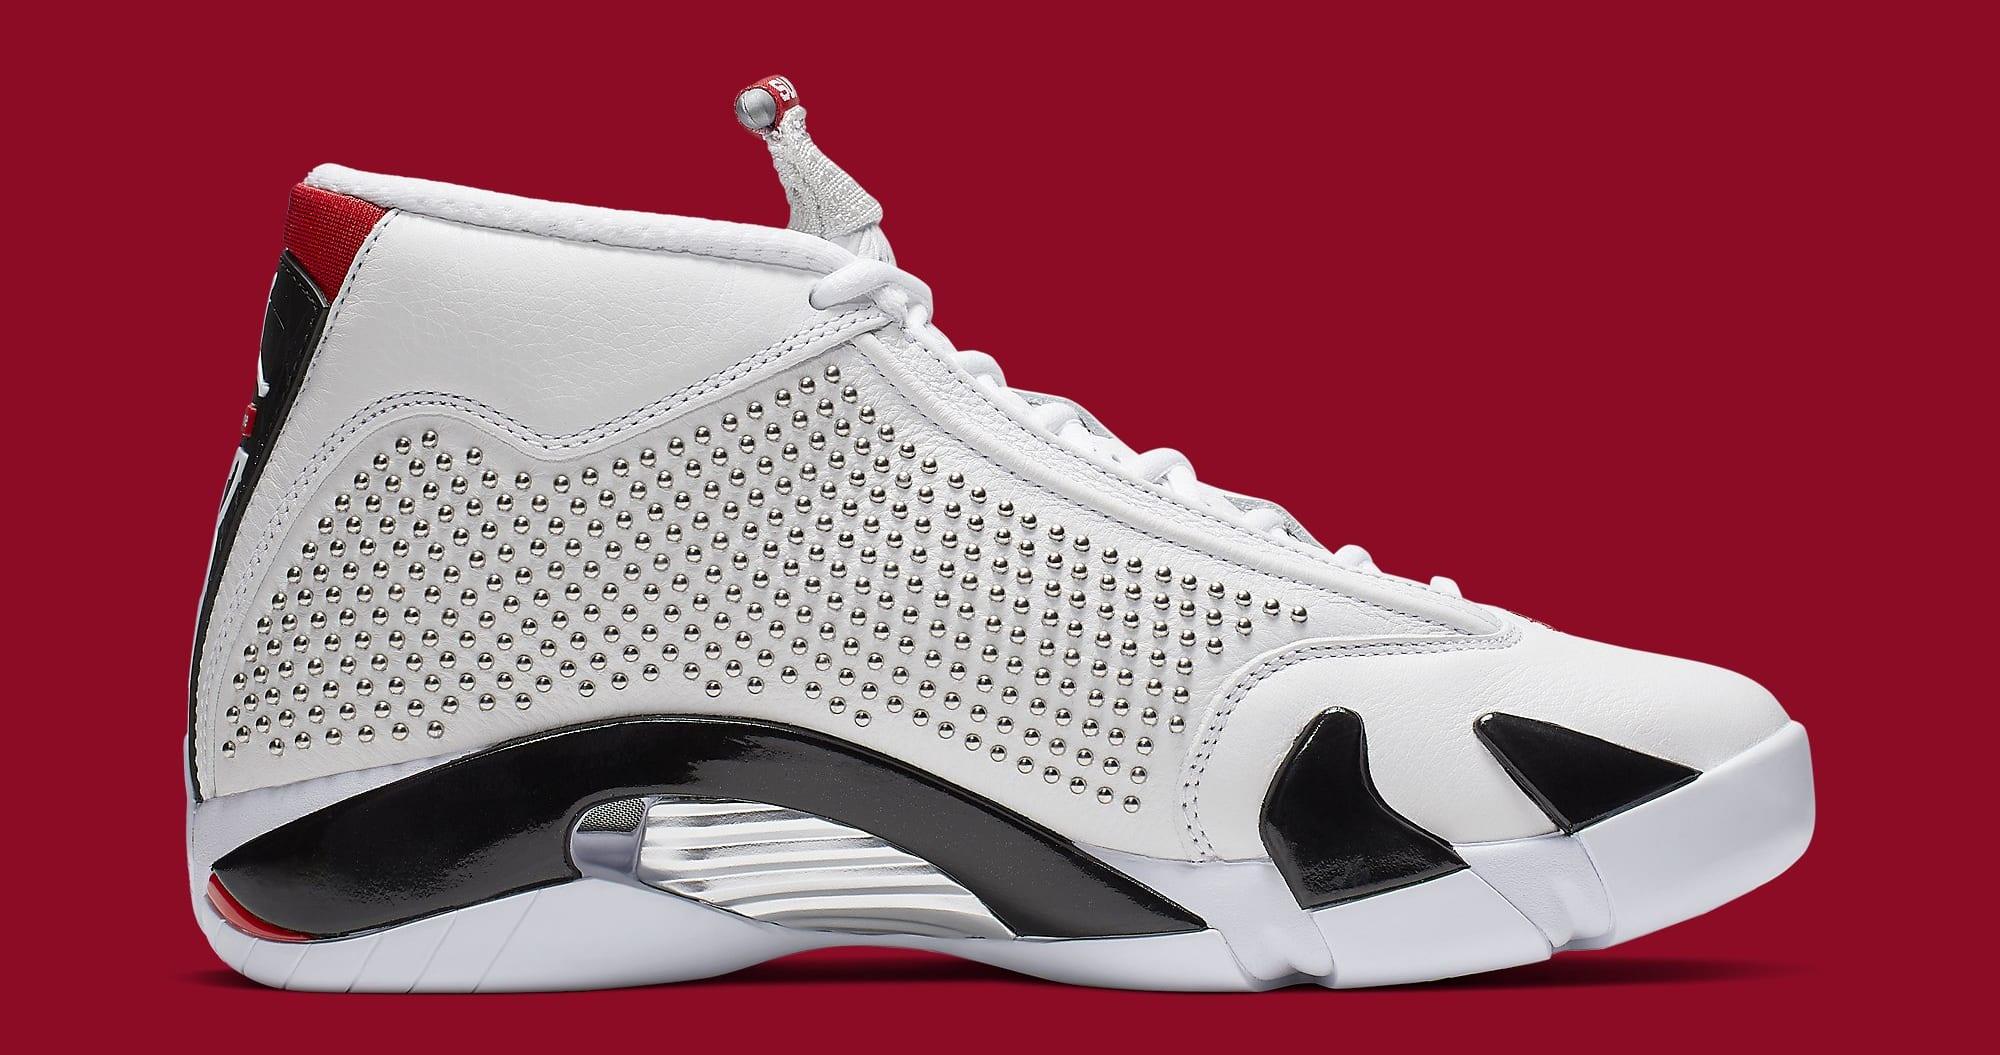 6a2aa53624e Image via Nike Supreme x Air Jordan 14 'White/University Red' BV7630-106  Medial